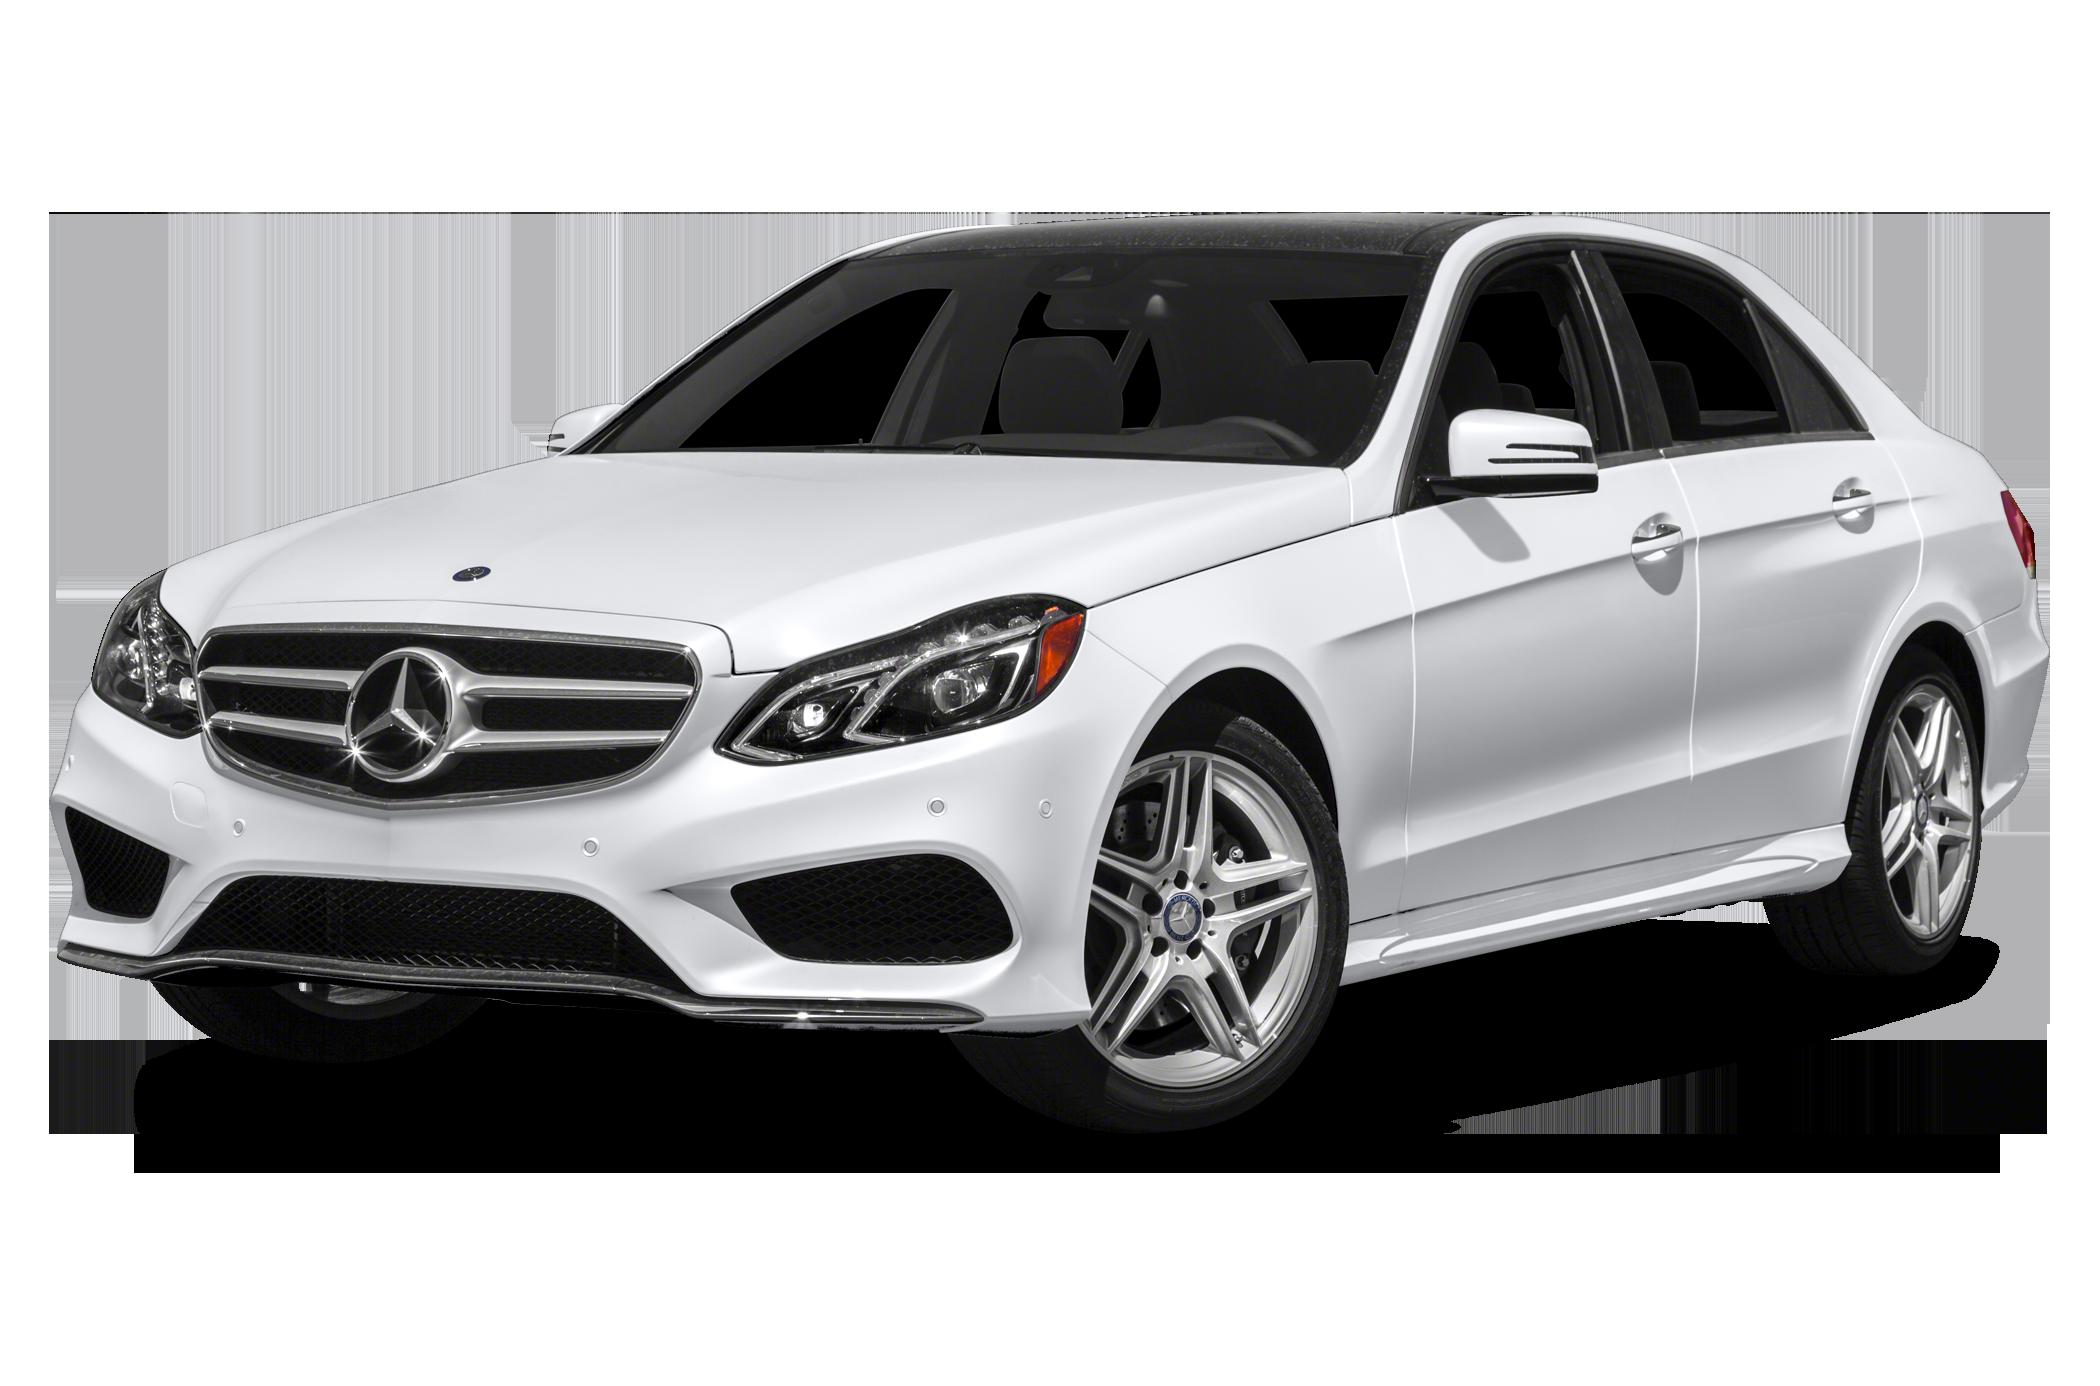 Mercedes e Class 2015 Black 2015 Mercedes-benz E-class